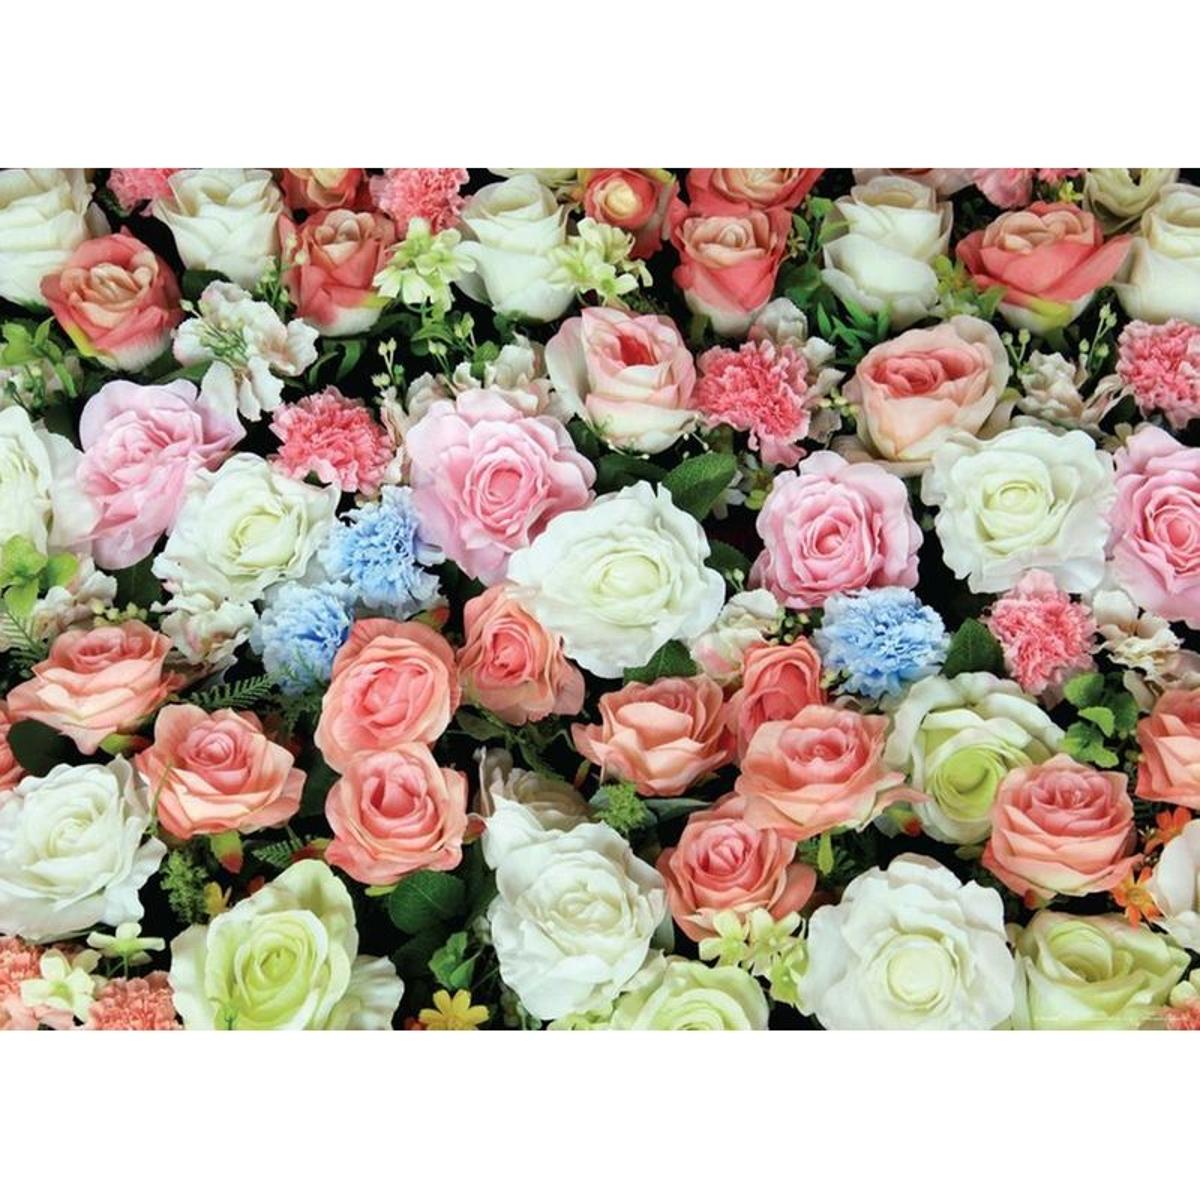 Roses, photo murale, 160 x 115 cm, 1 part